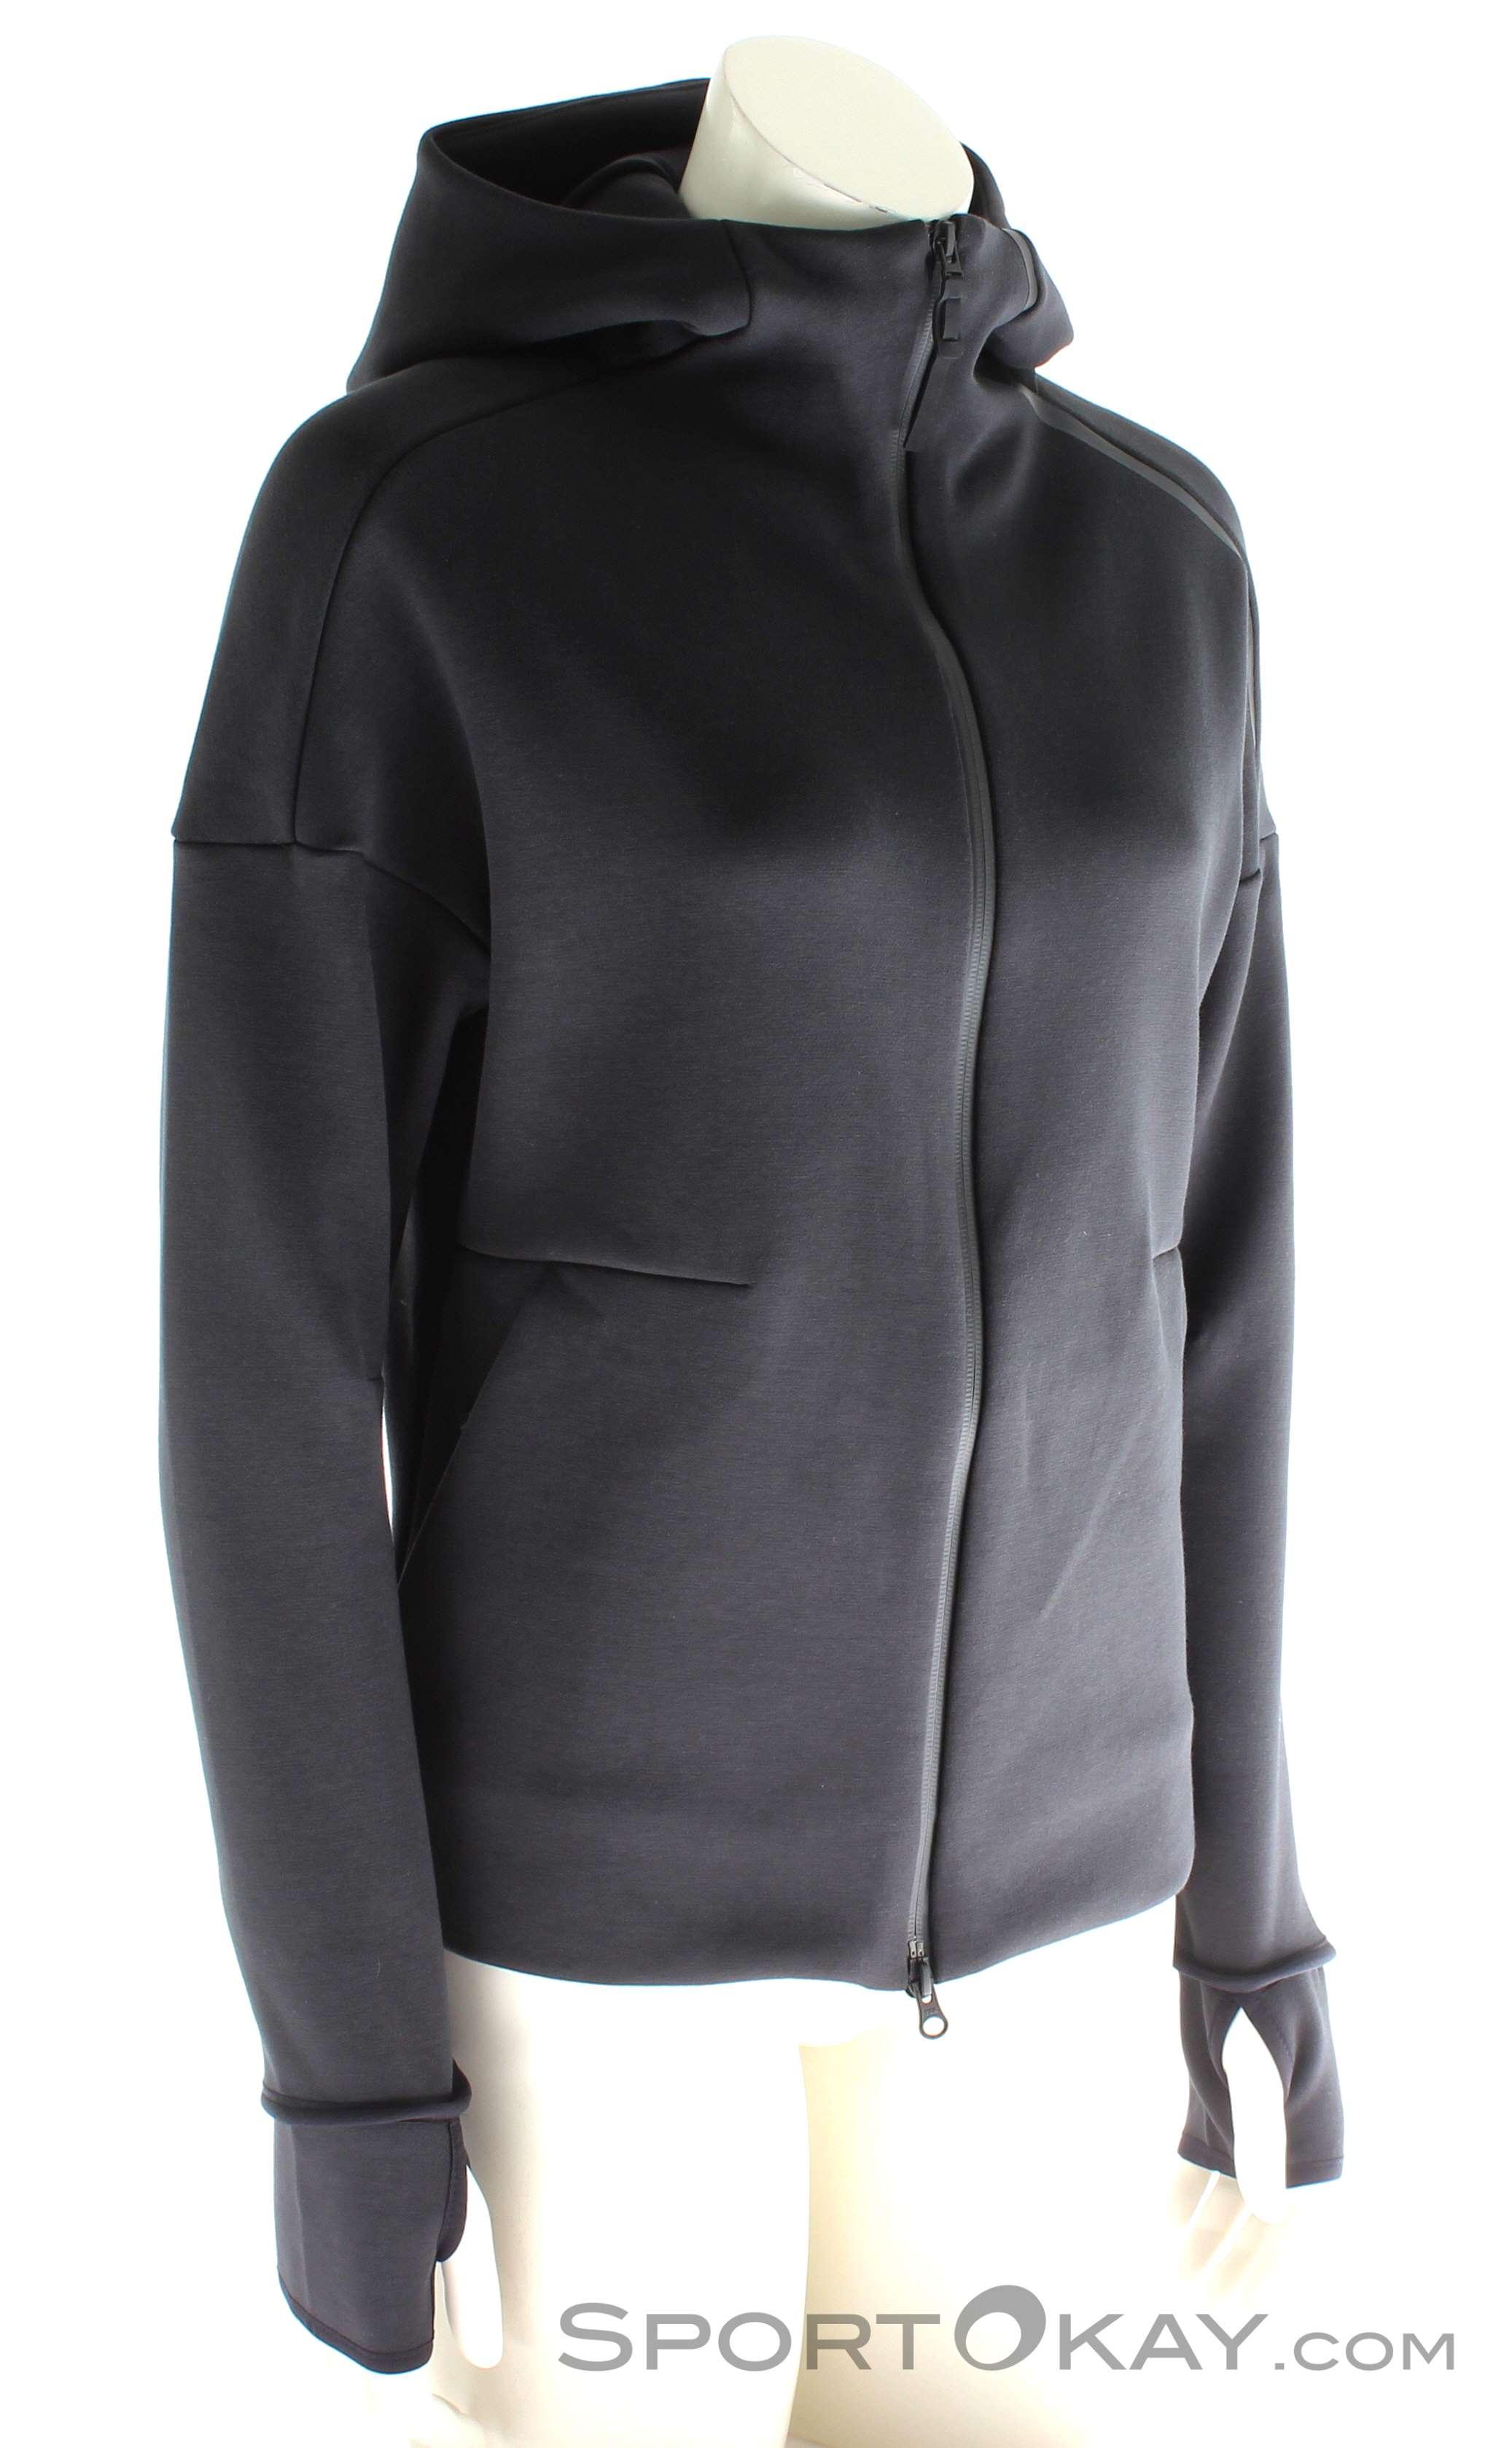 adidas adidas ZNE Hoodie 2 Damen Trainingssweater